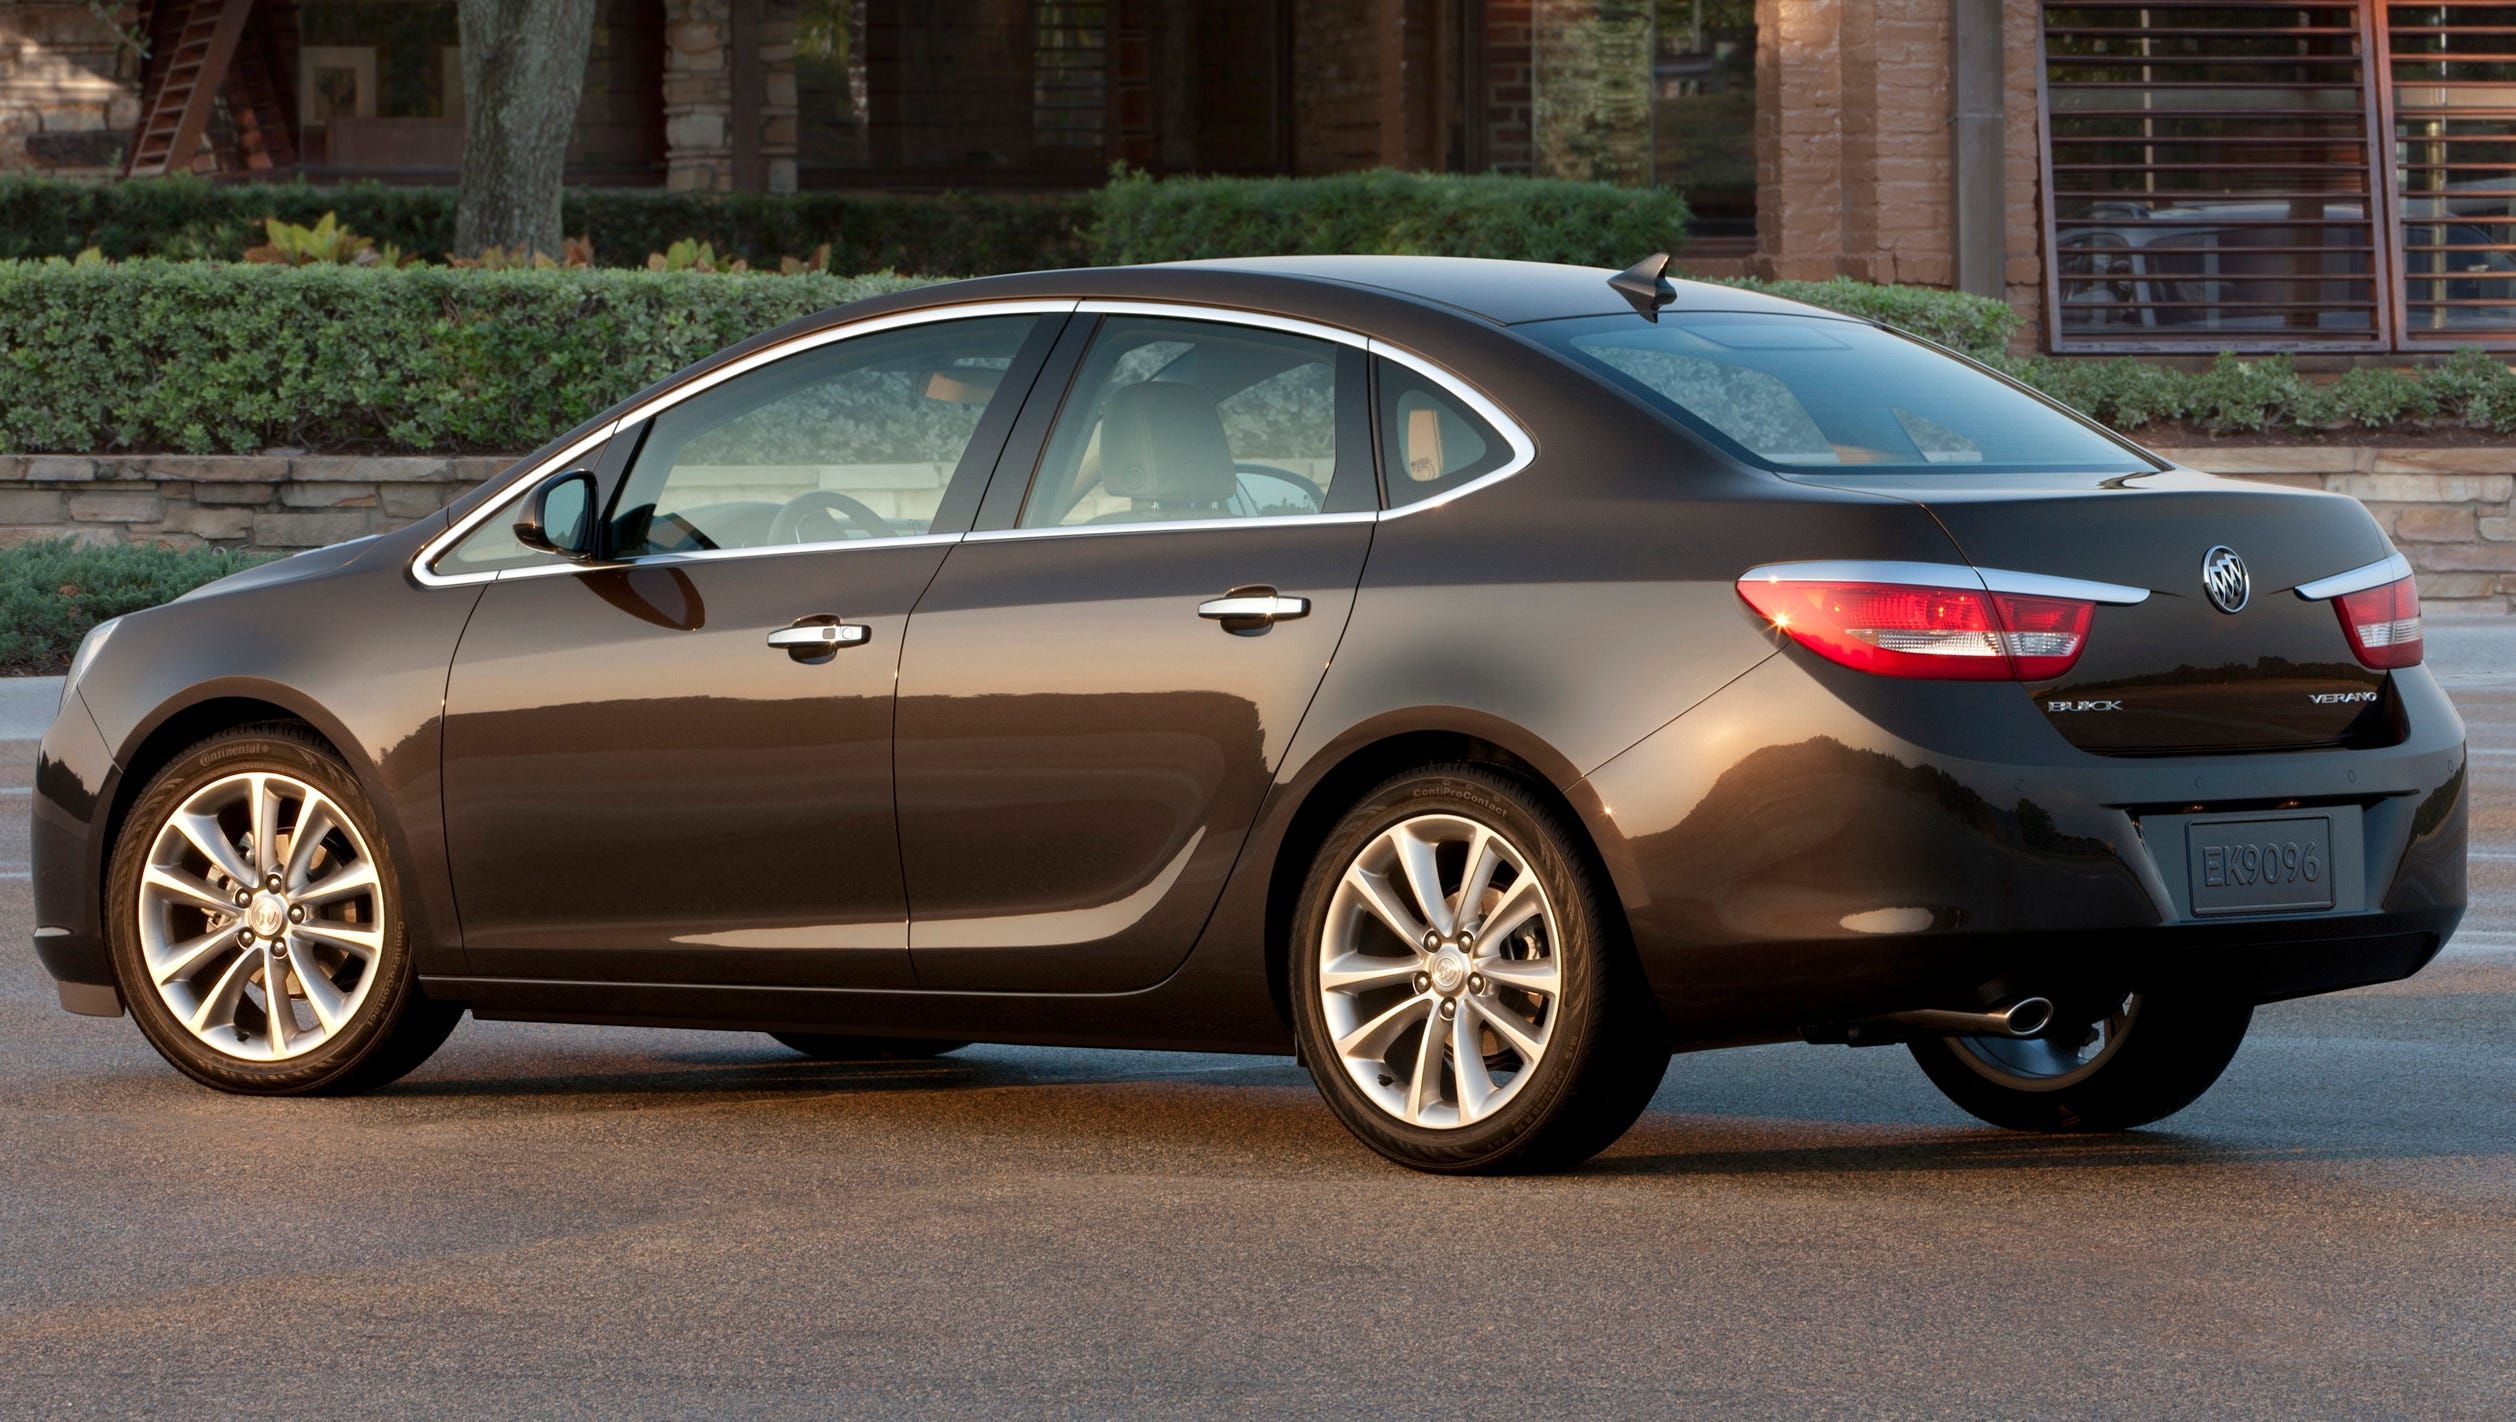 Buick Verano Review >> Gm Killing Off Its Trusty Buick Verano Compact Car